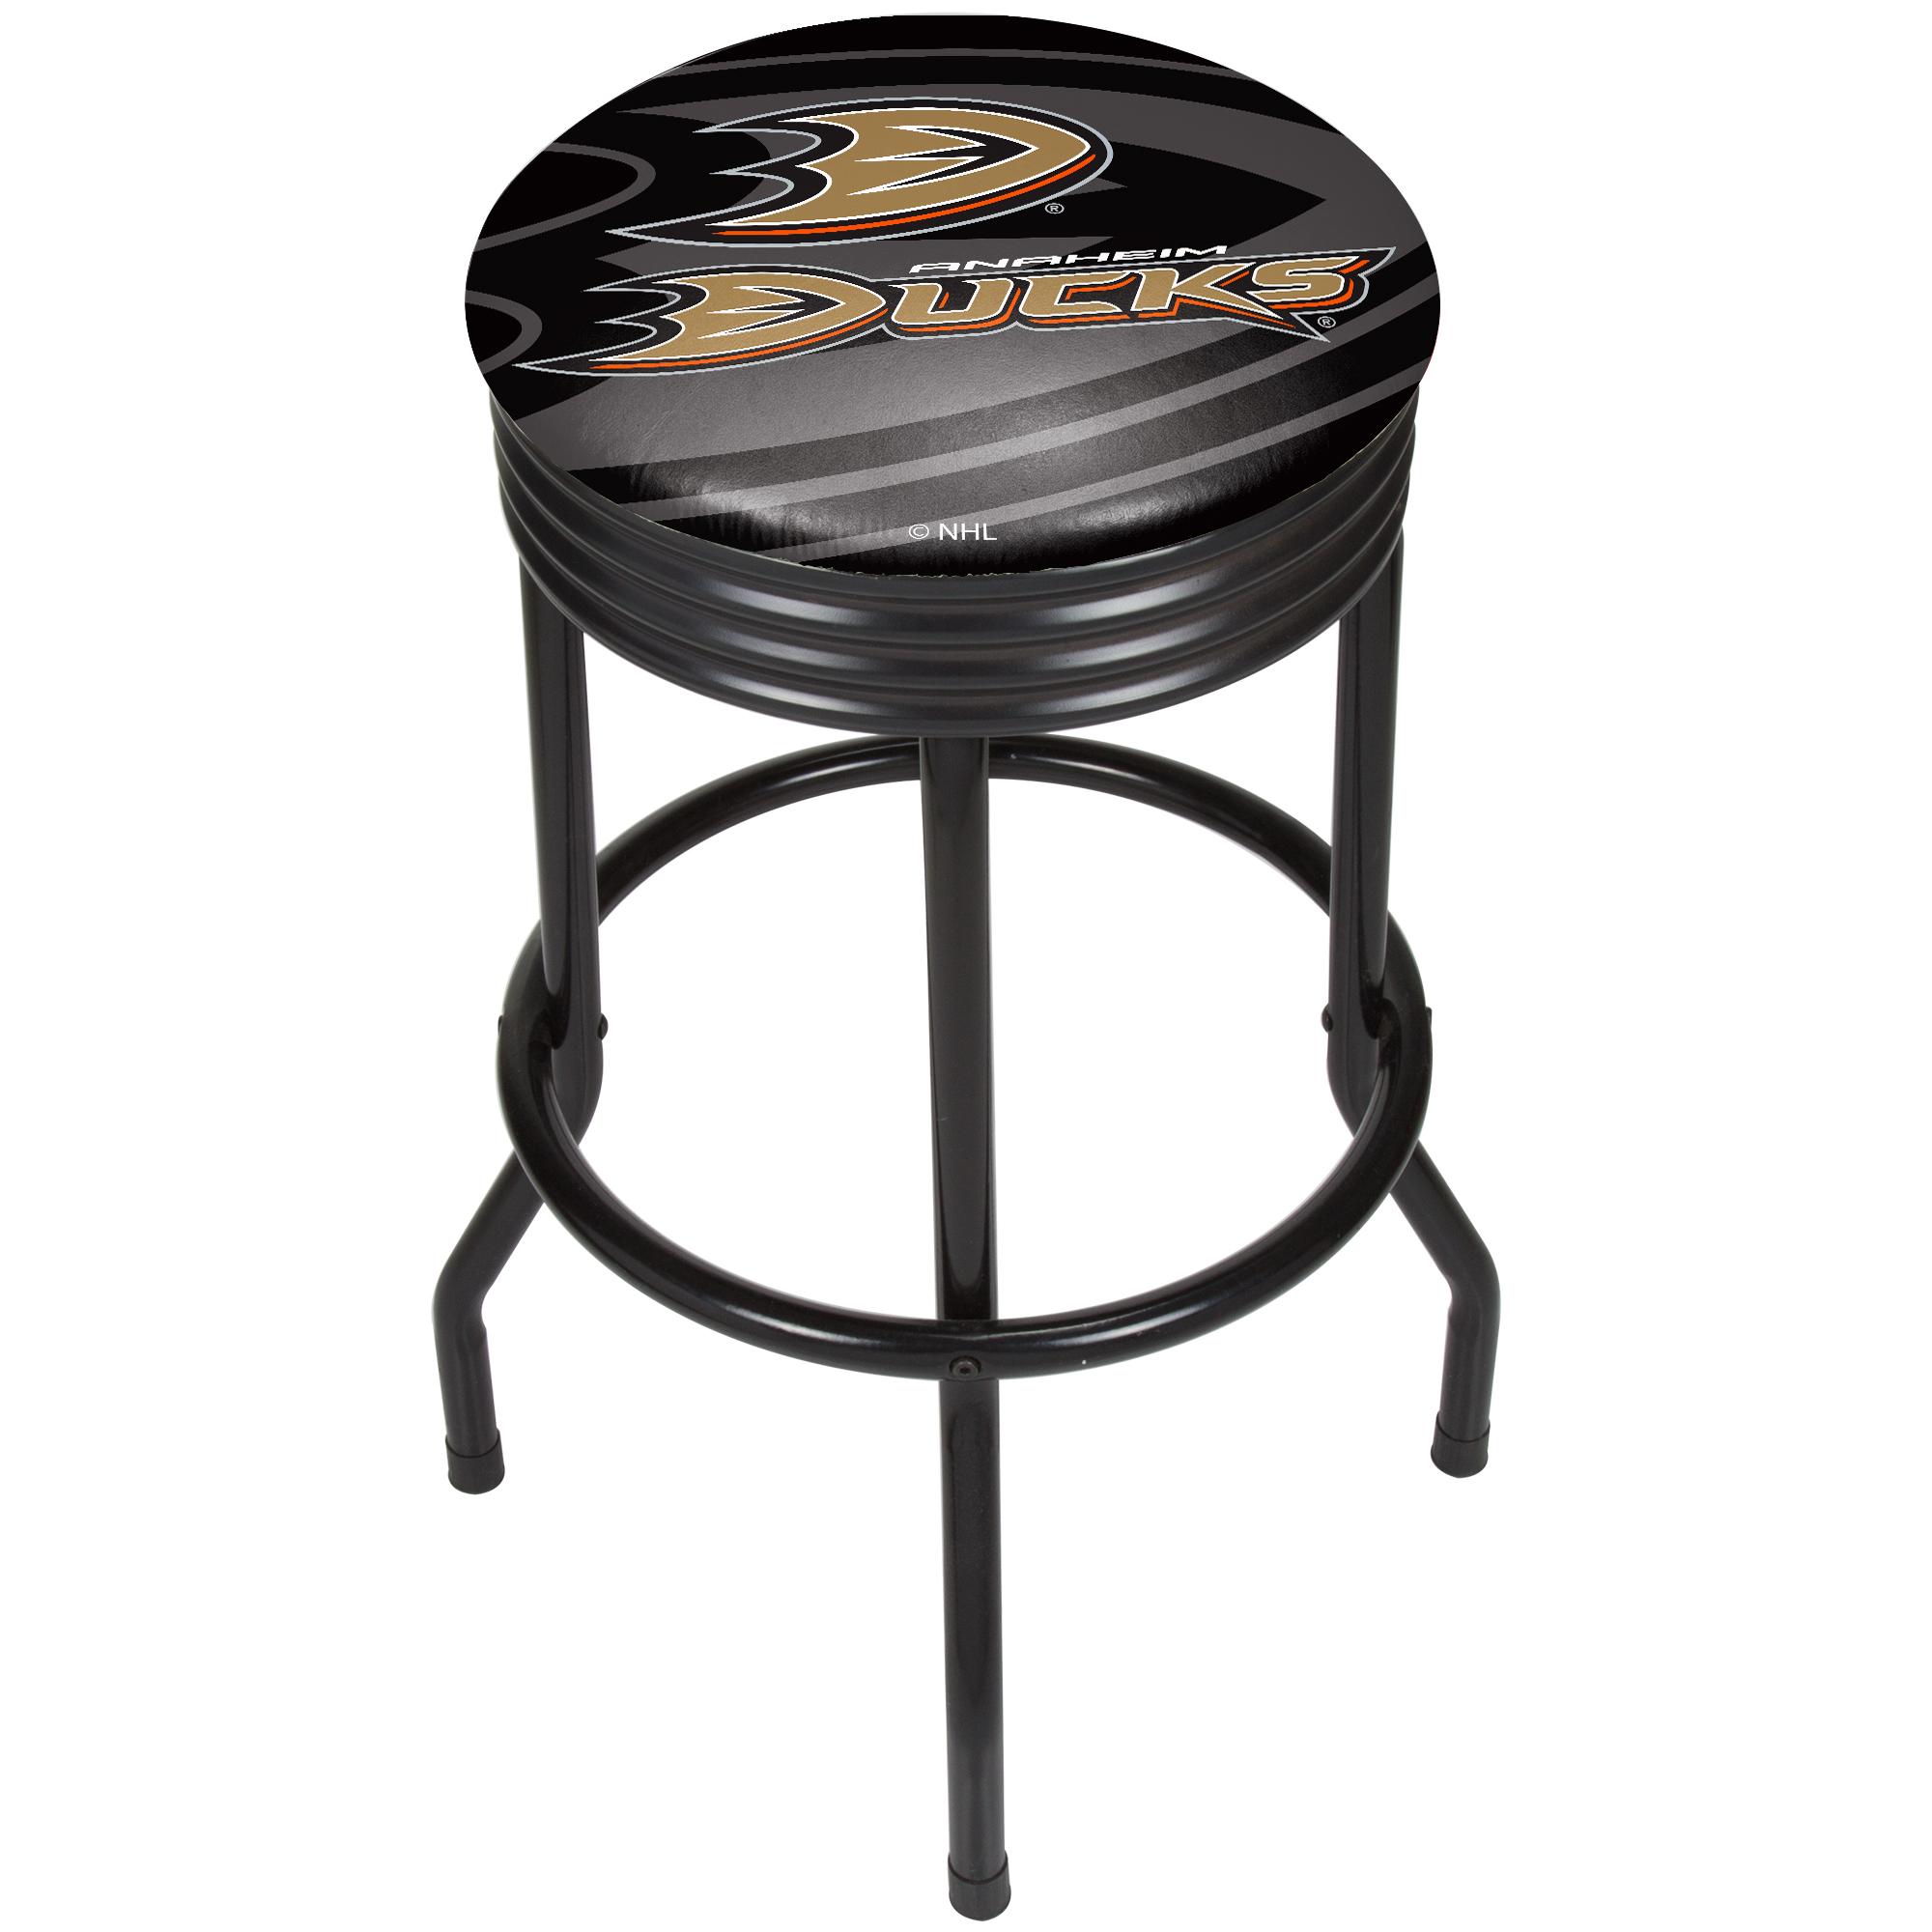 NHL Black Ribbed Bar Stool - Anaheim Ducks